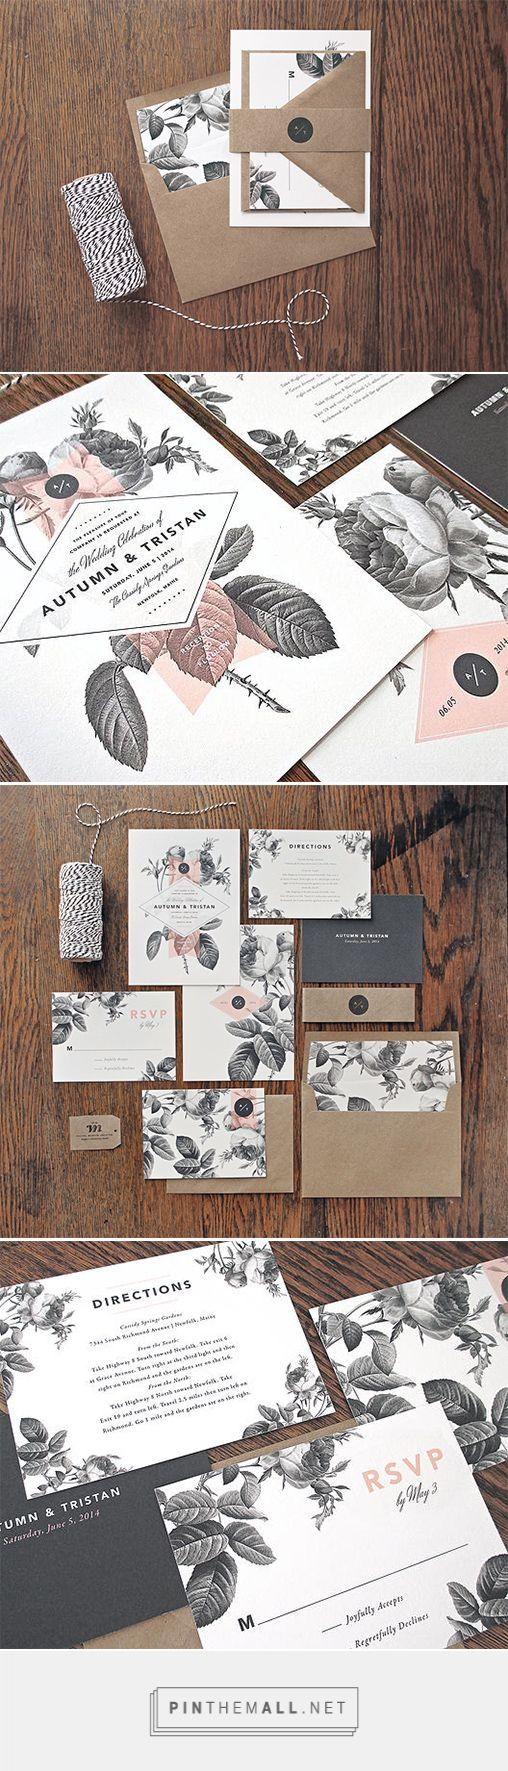 Floral Wedding Invitations | Fivestar Branding – Design and Branding Agency & Inspiration Gallery